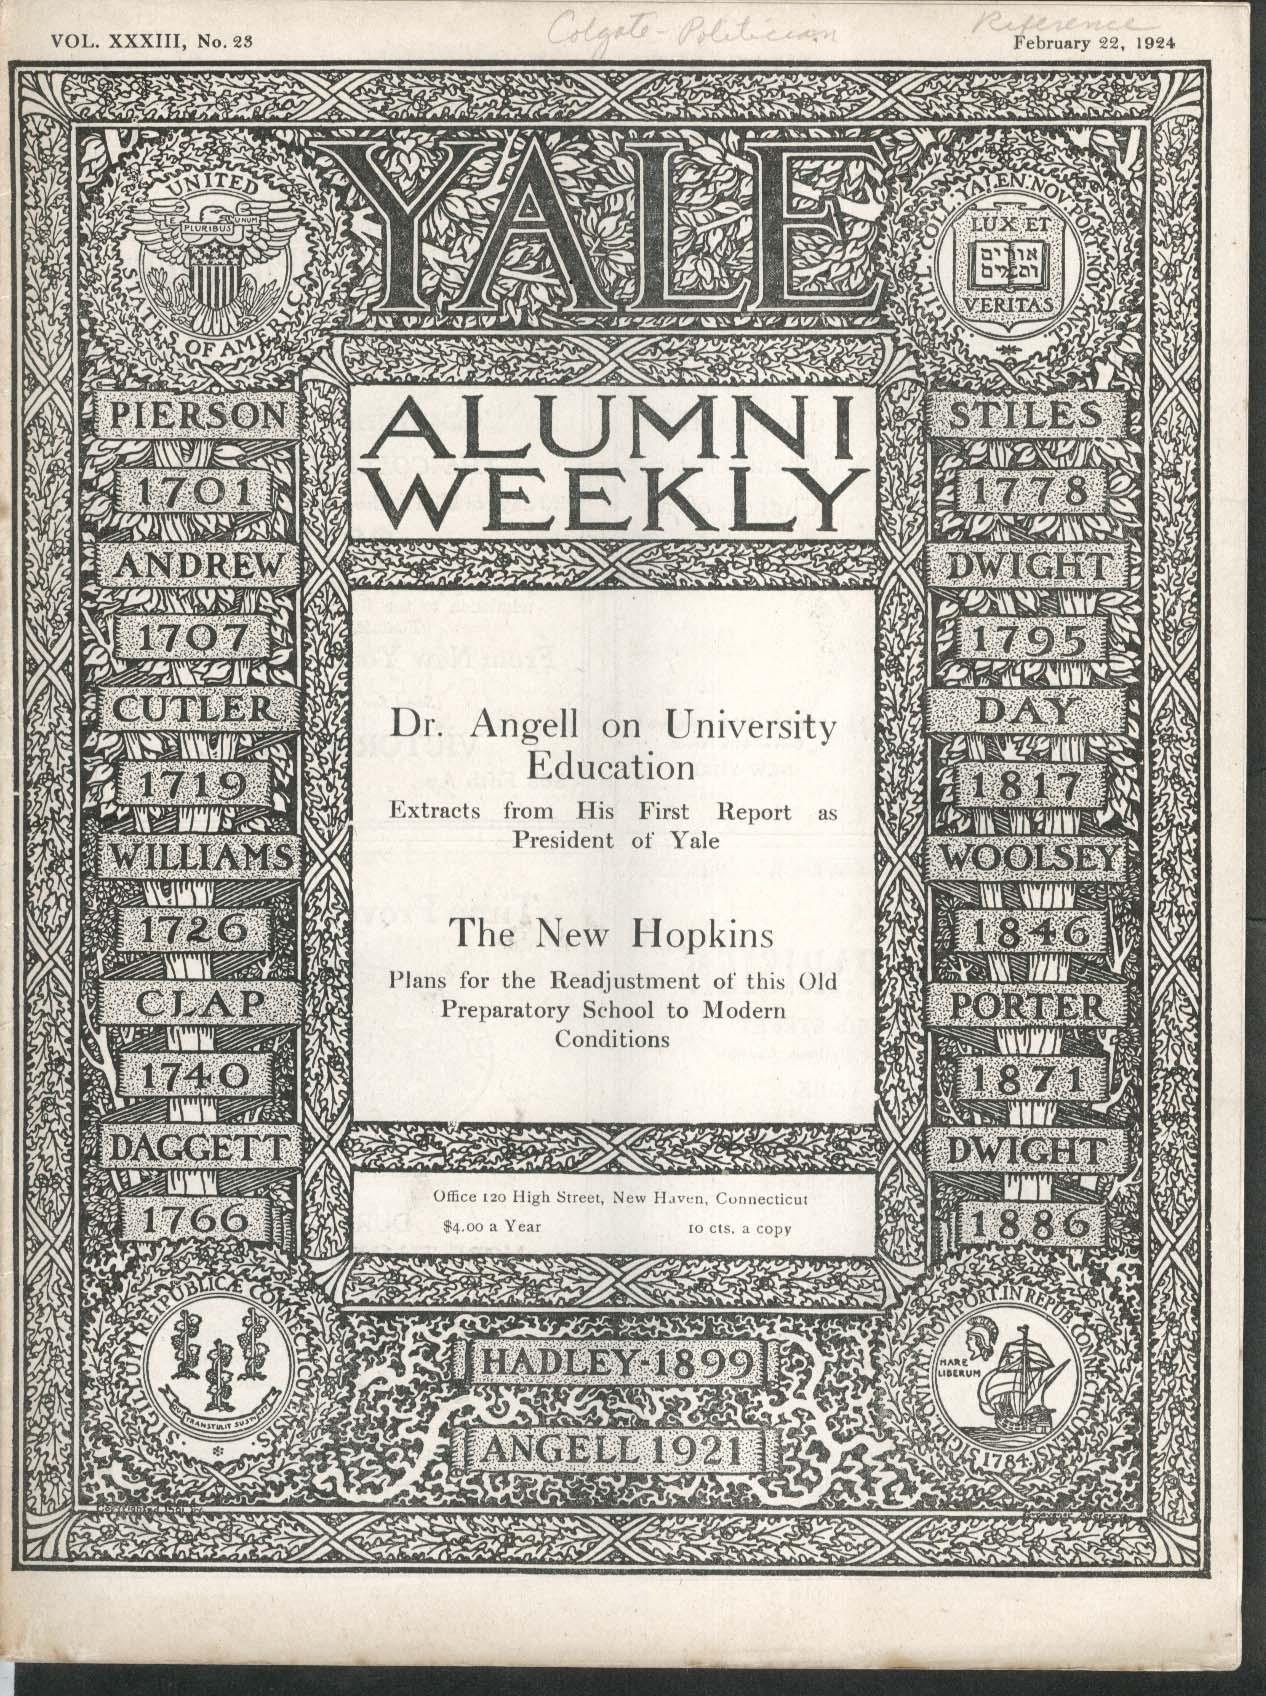 YALE ALUMNI WEEKLY Angell University Education New Hopkins 2/22 1924